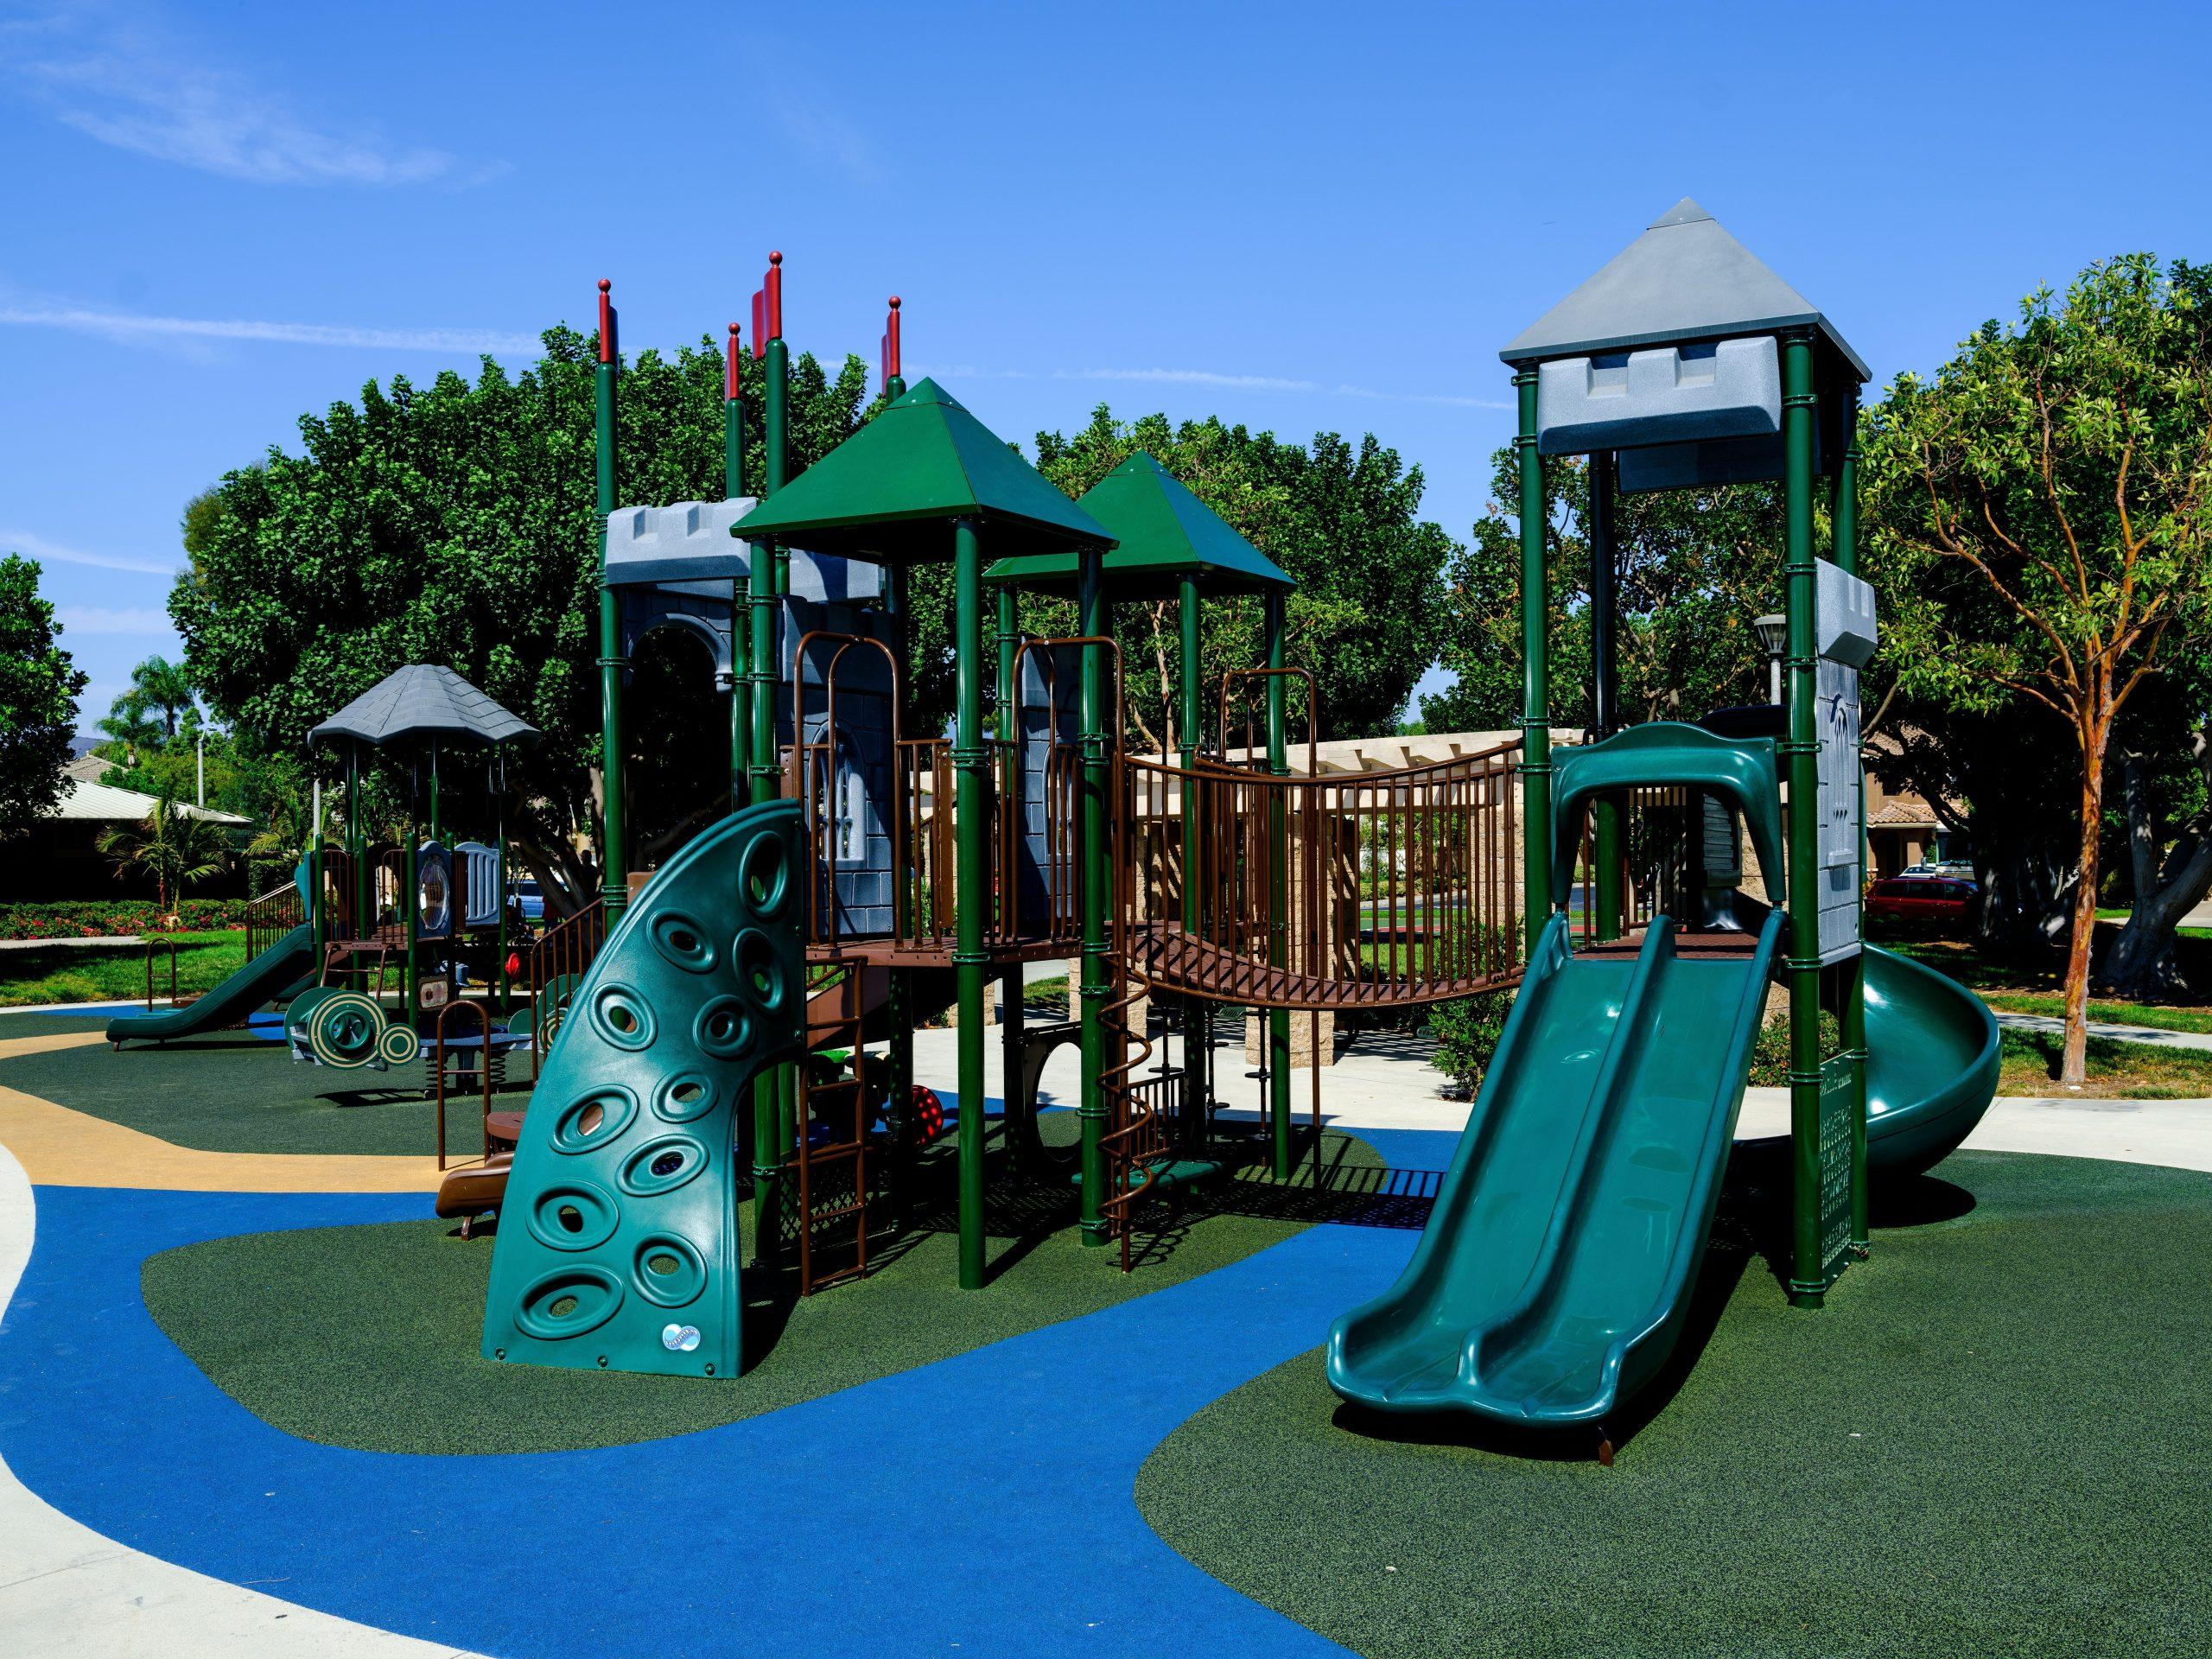 KidBuilders playground structure